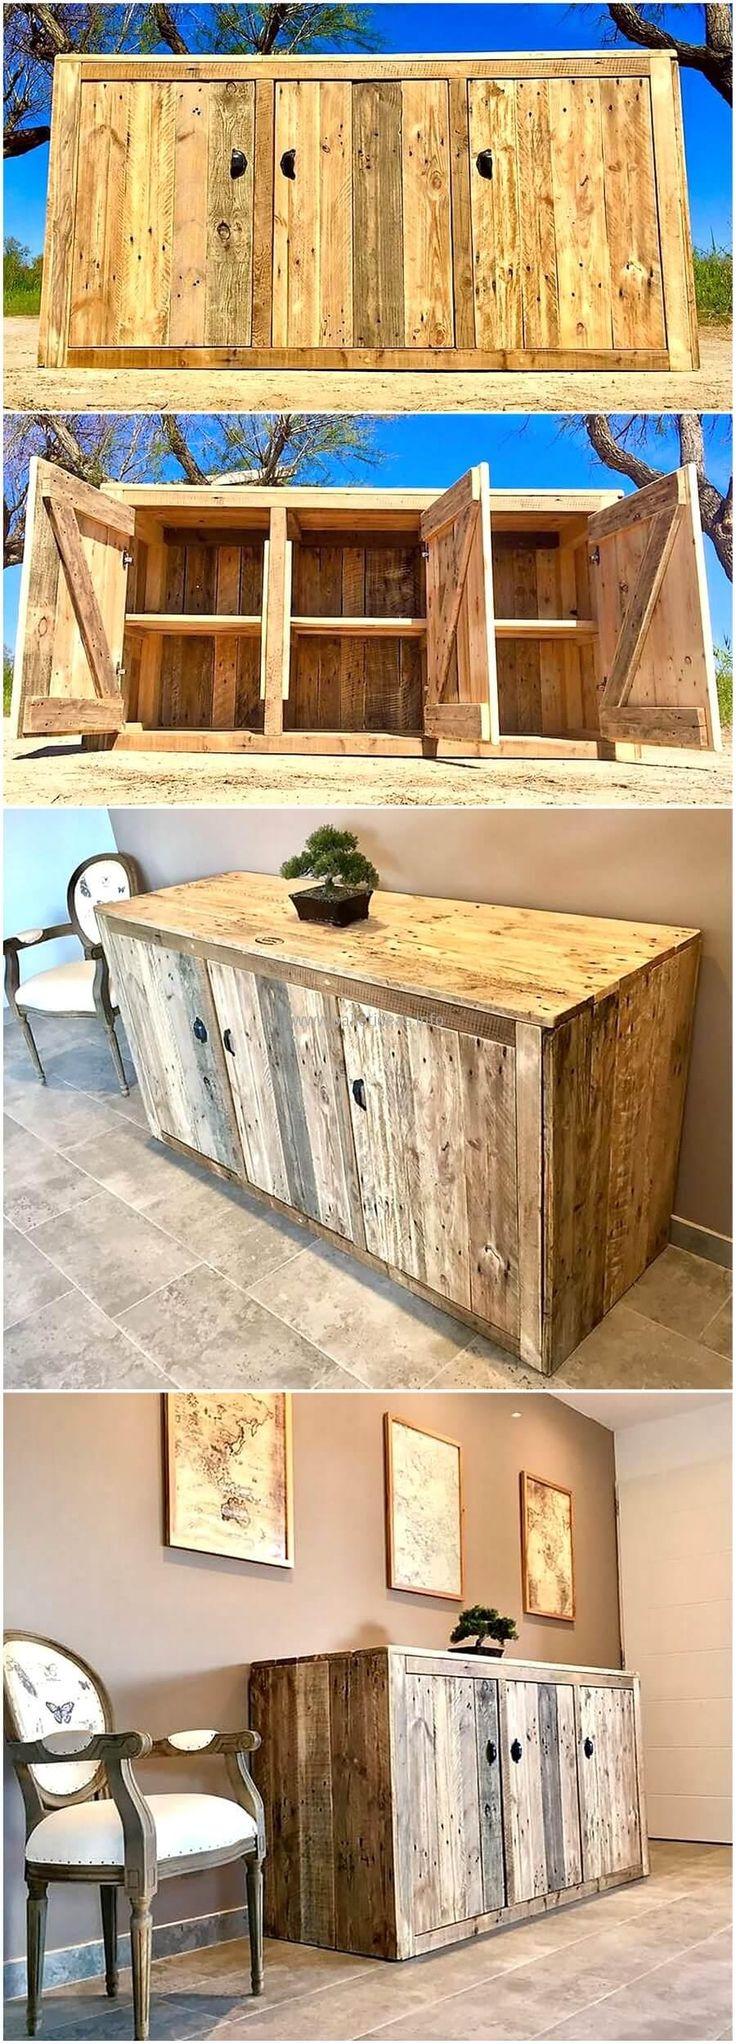 Wood Pallet House 625 Best Pallets Creative Reuse Repurposing Images On